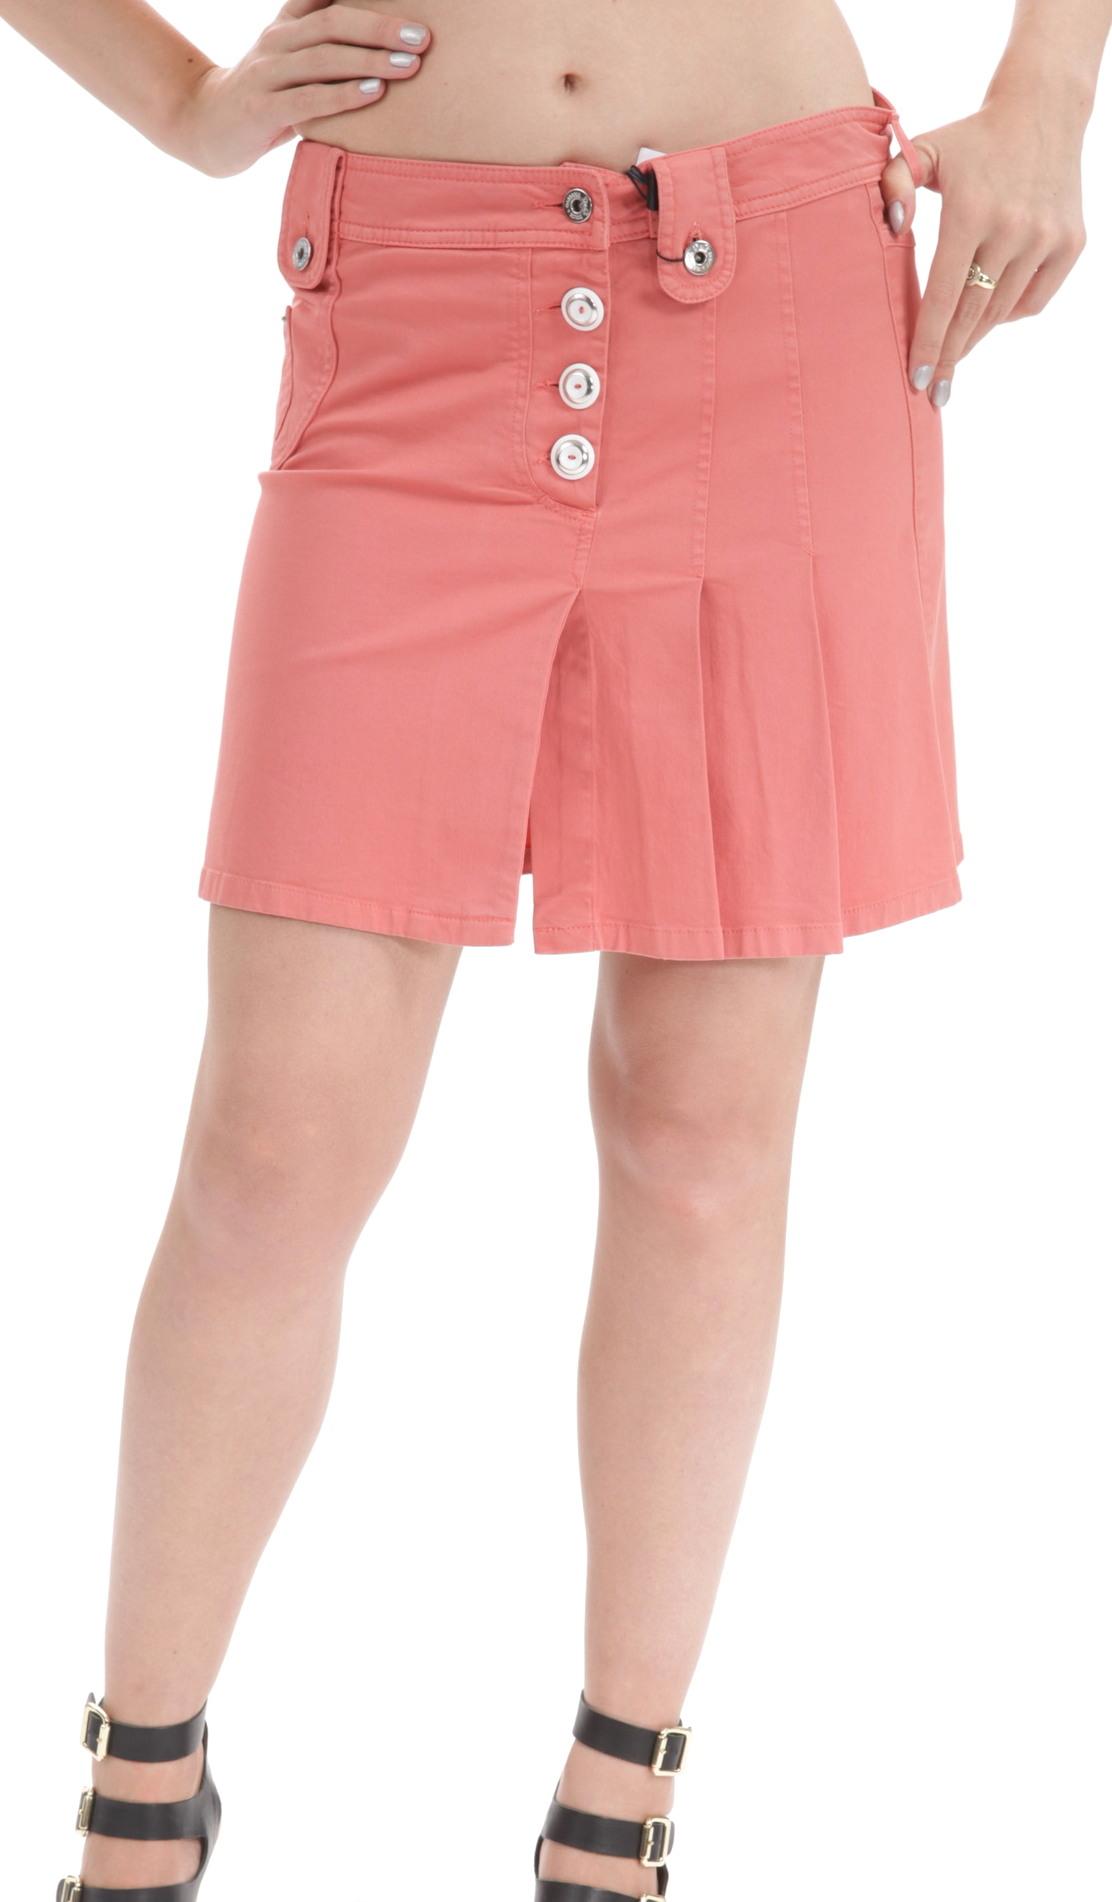 Dolce & Gabbana Women's Orange Cargo Denim Mini Skirt STO36 at Sears.com